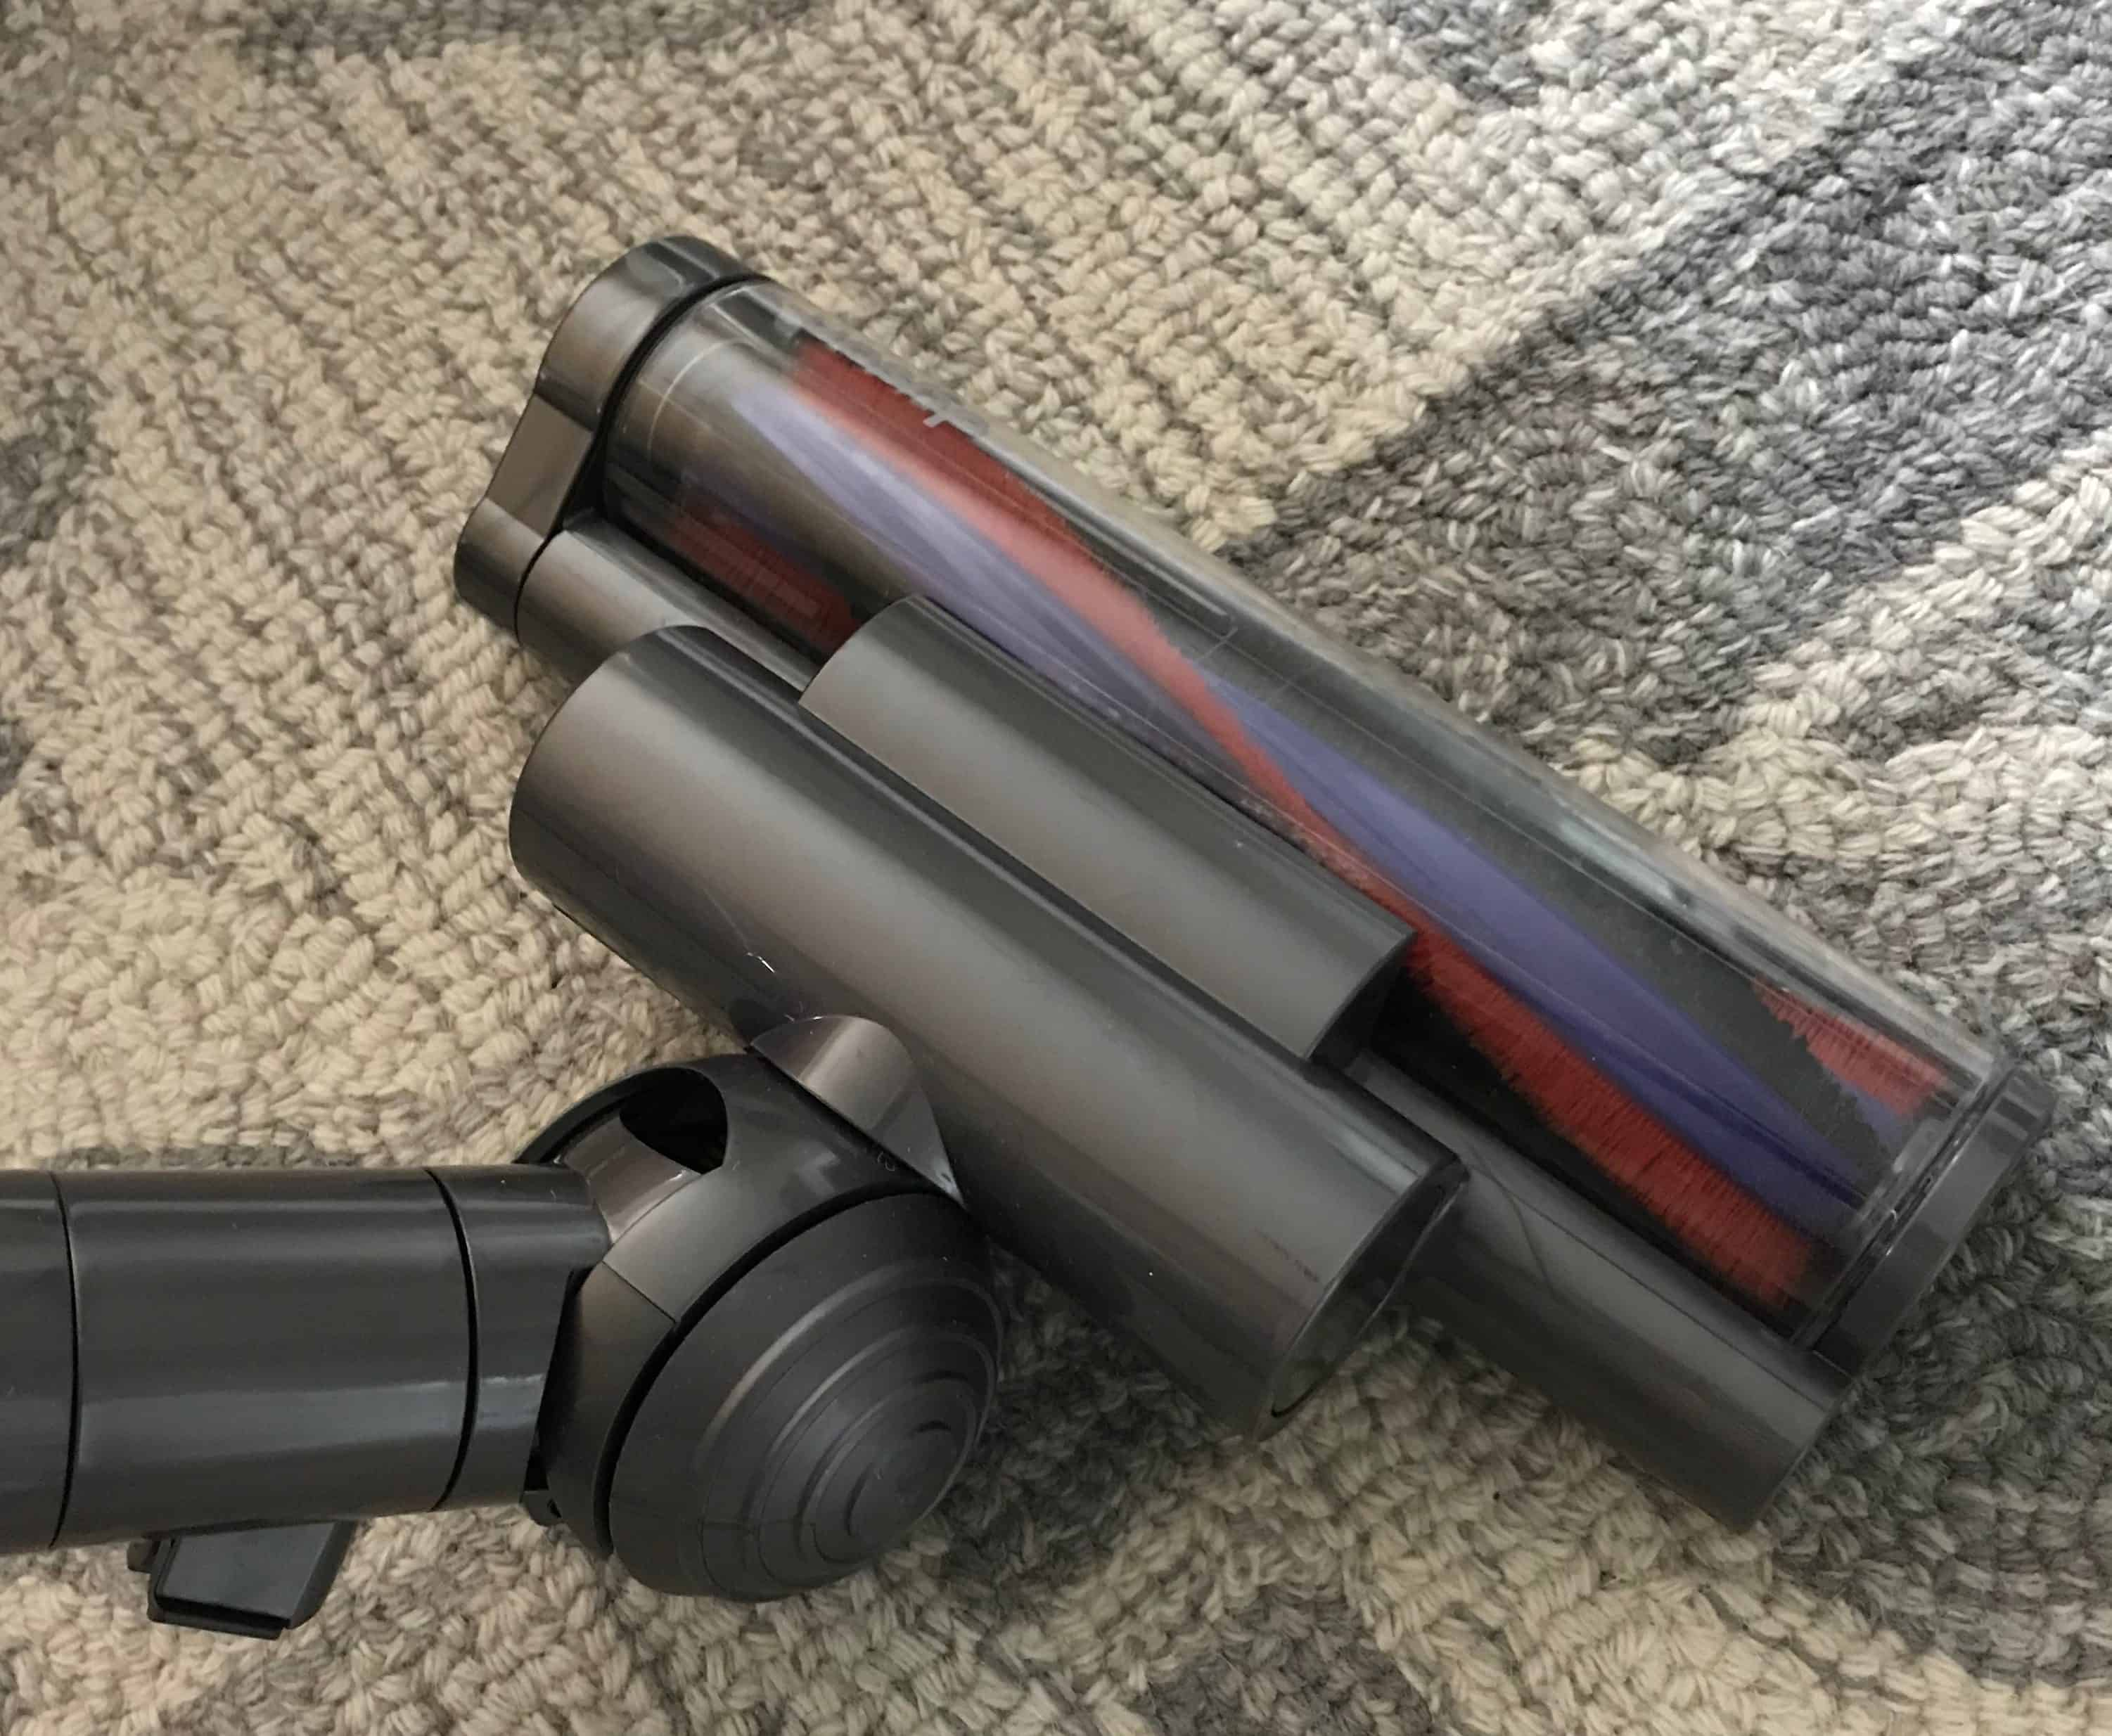 Dyson Ball Multi Floor Vacuum head